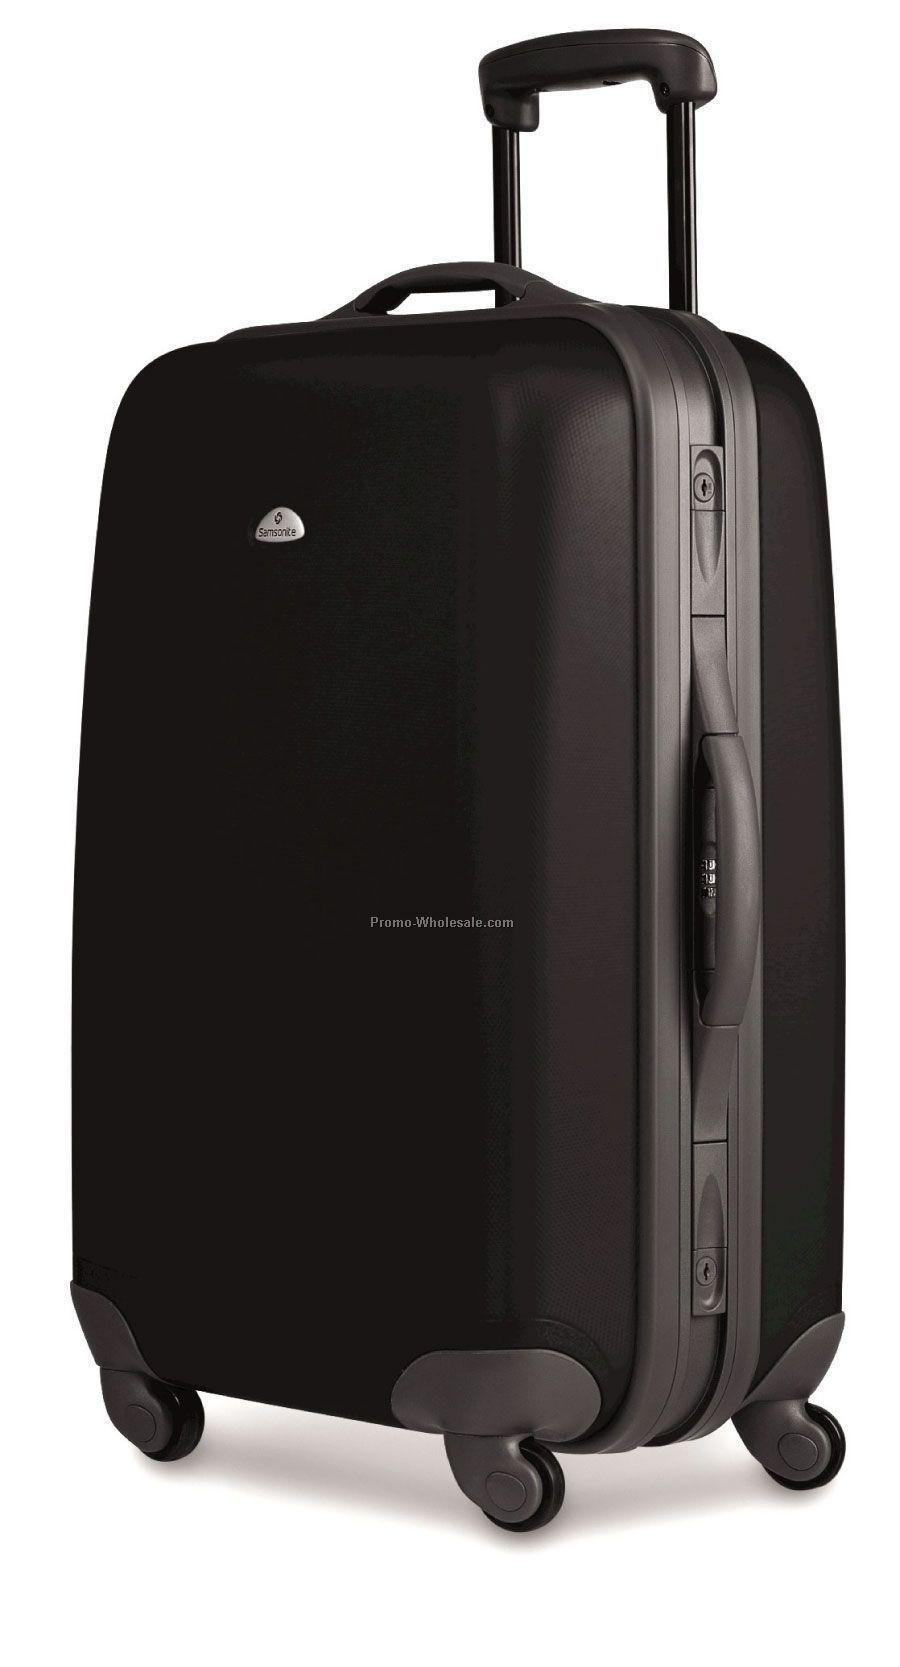 24 Spinner Upright Cruiseair Suitcase